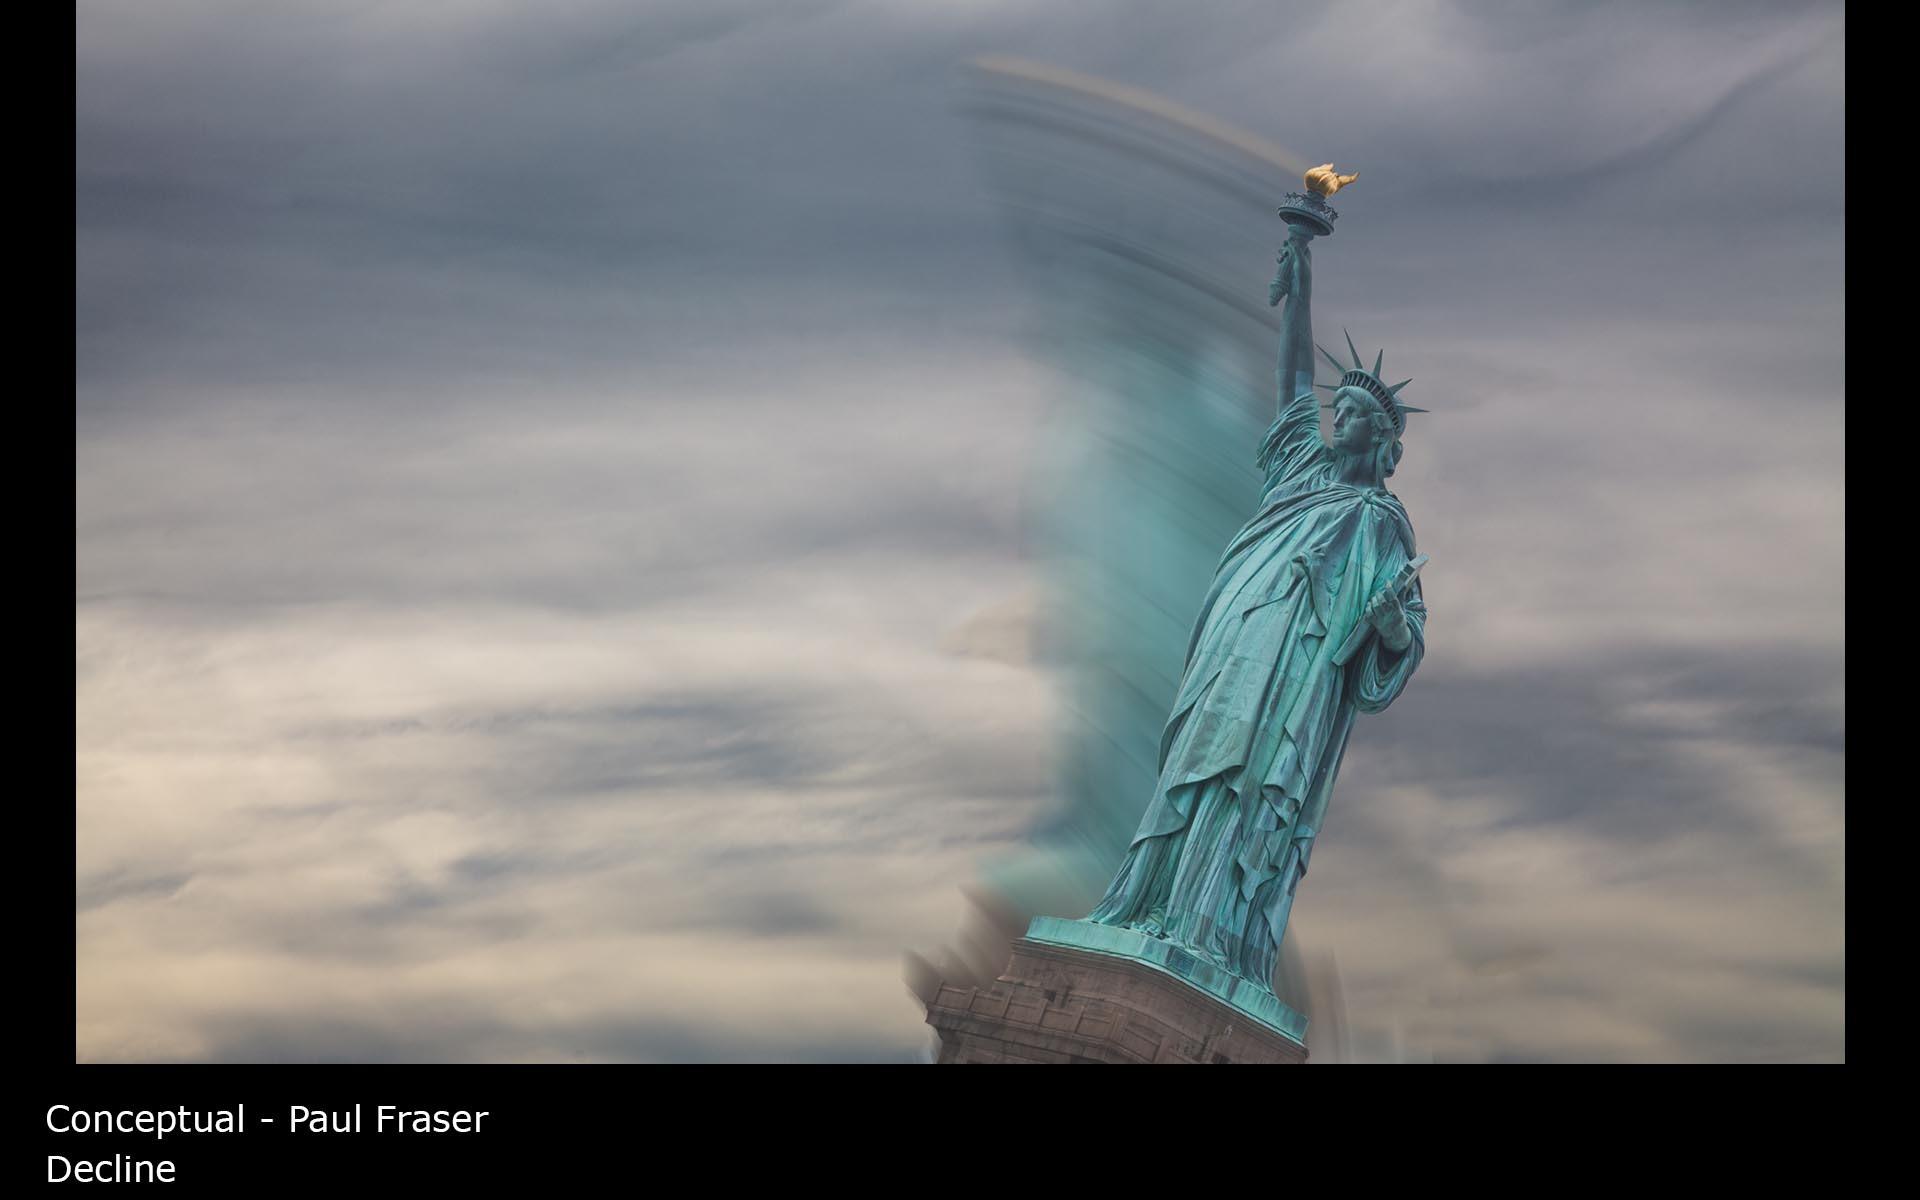 Decline - Paul Fraser